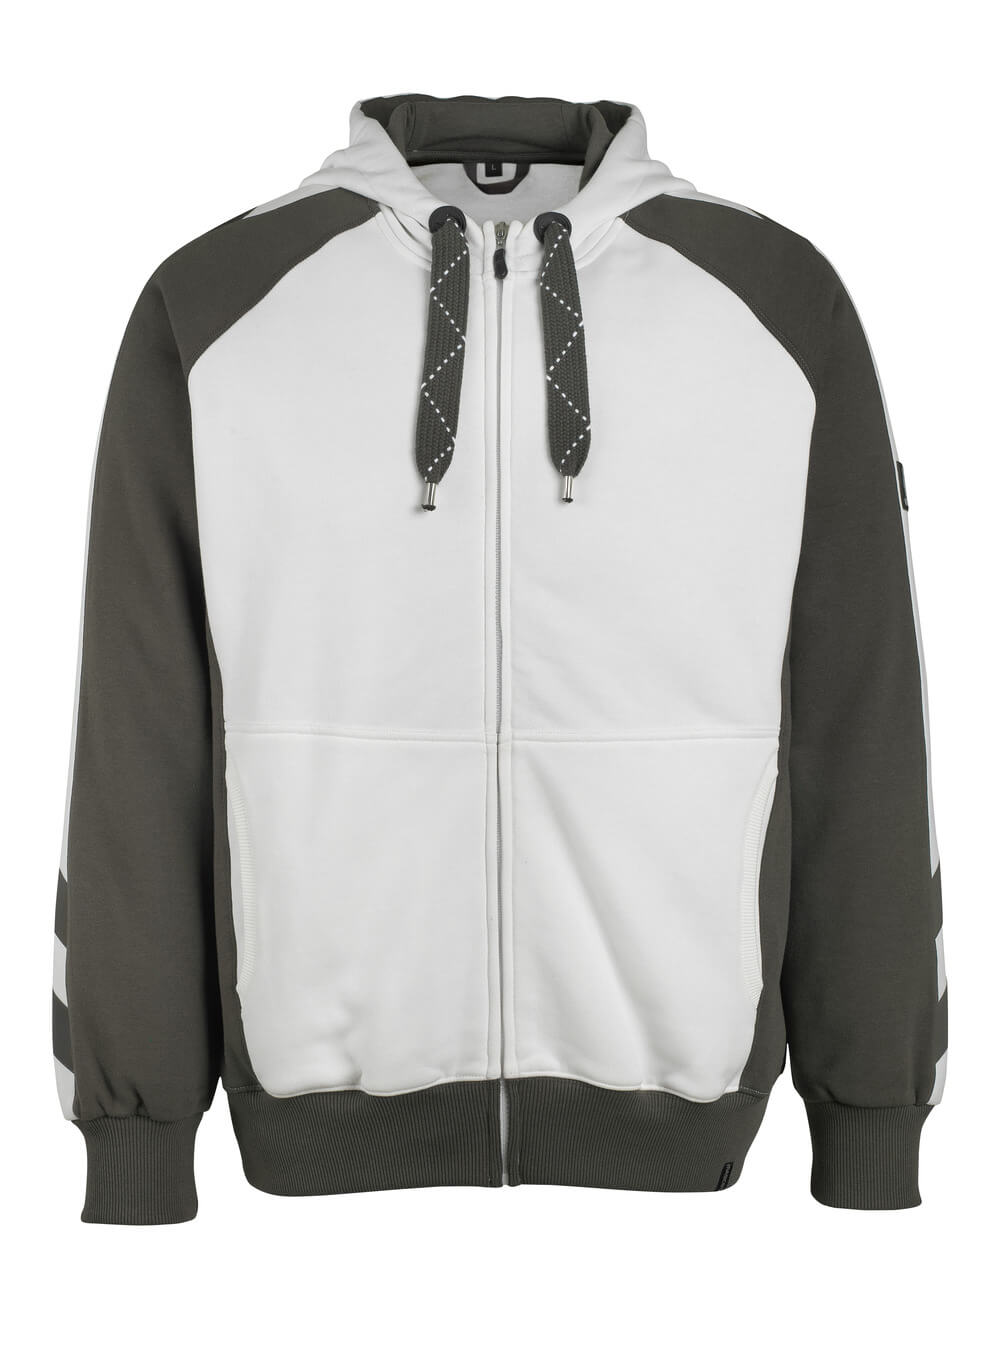 50509-811-0618 Hoodie with zipper - white/dark anthracite